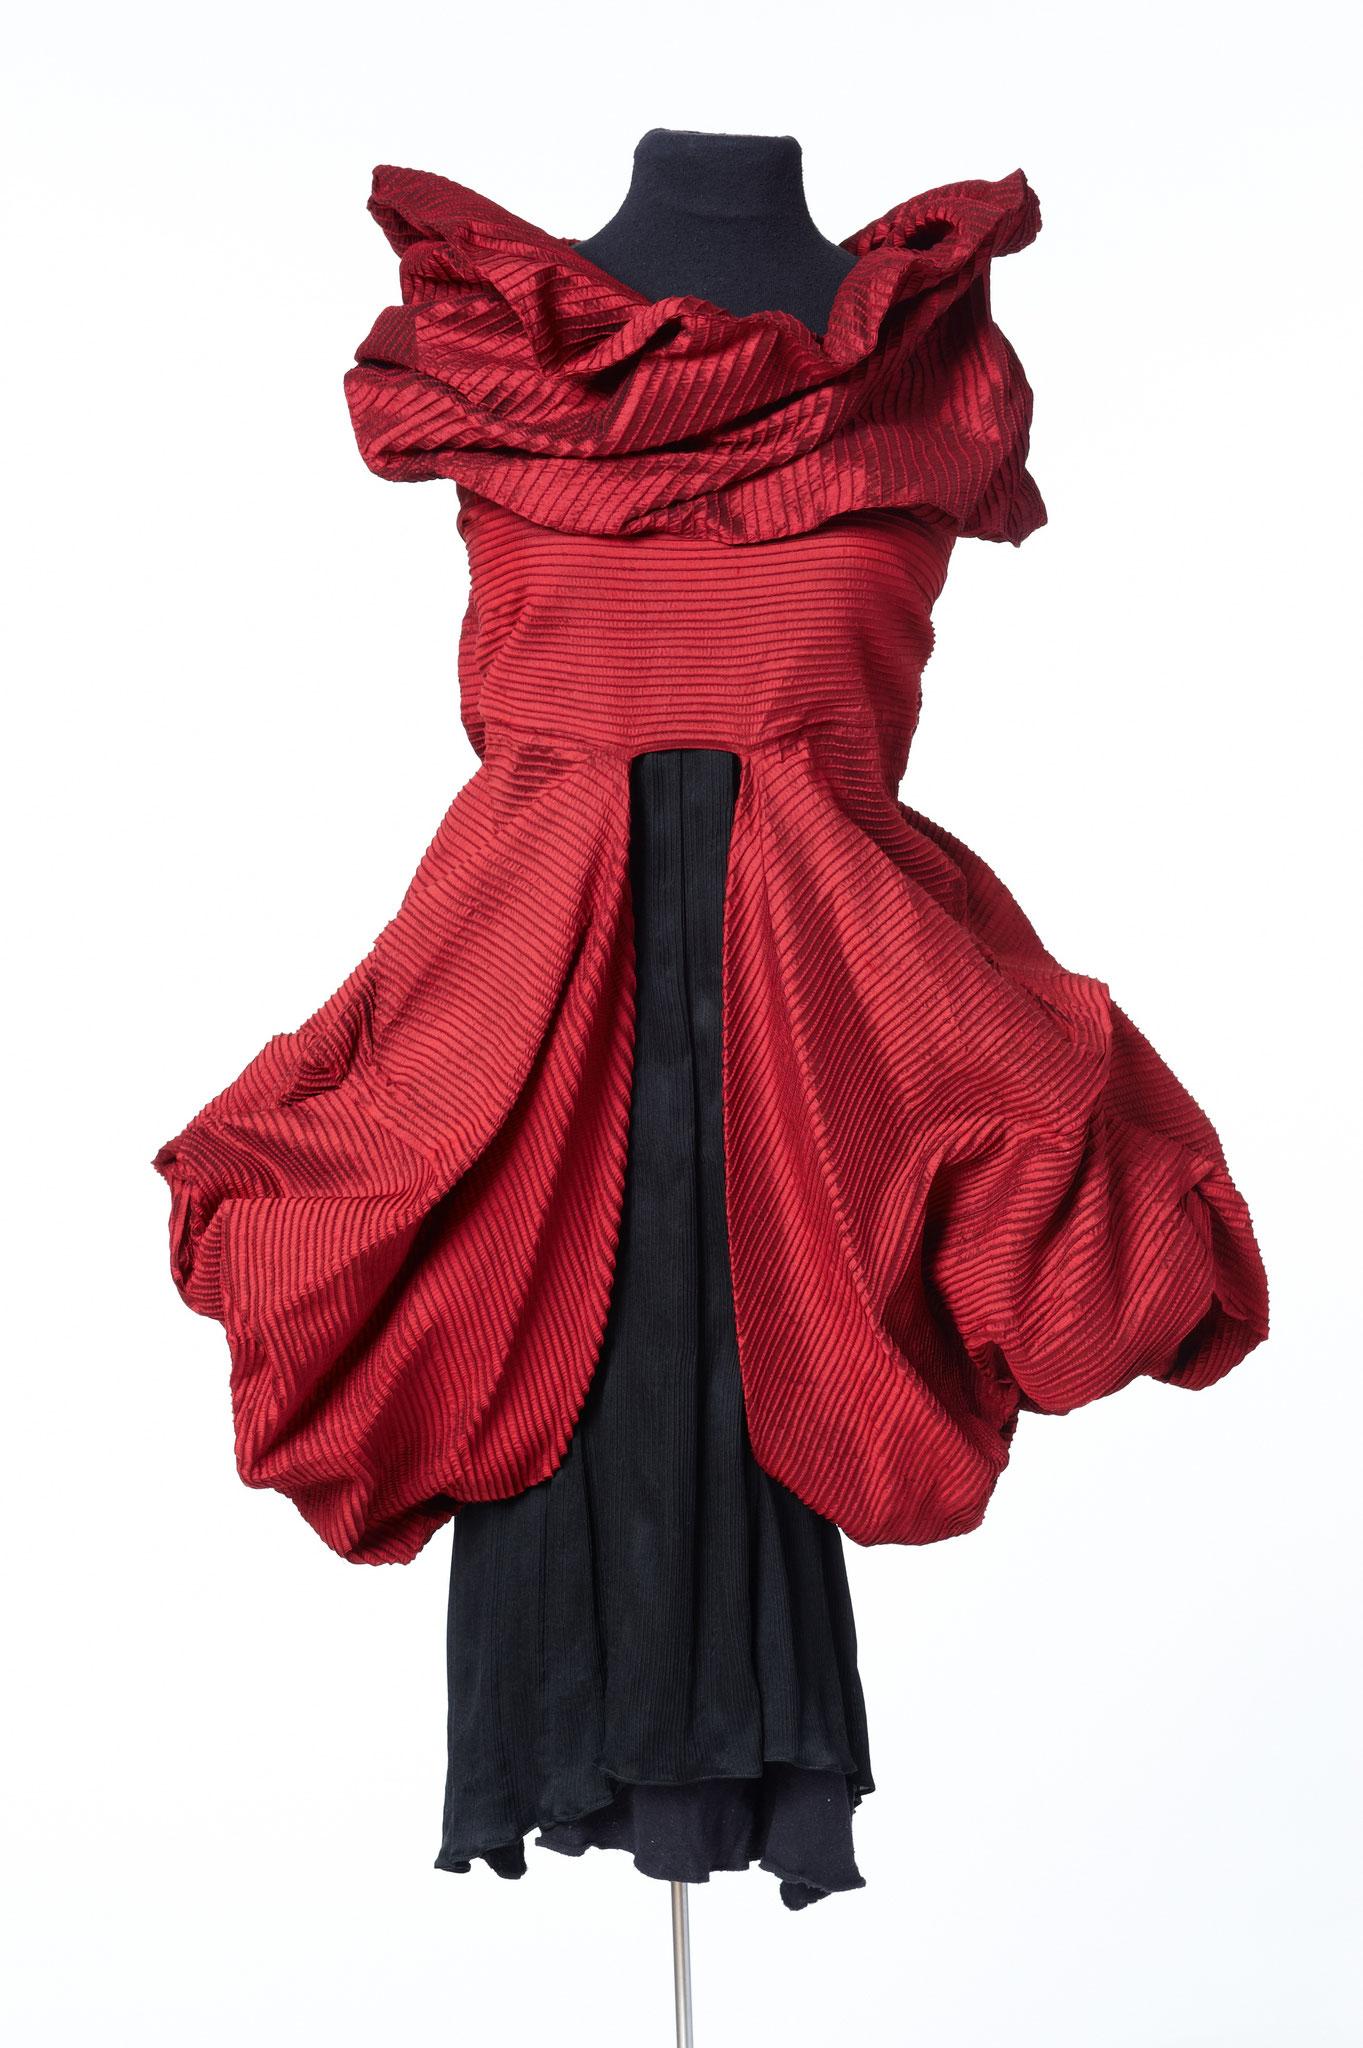 Moogler und Schal: Bochumer Designpreis 2010. Material:  100% Seide